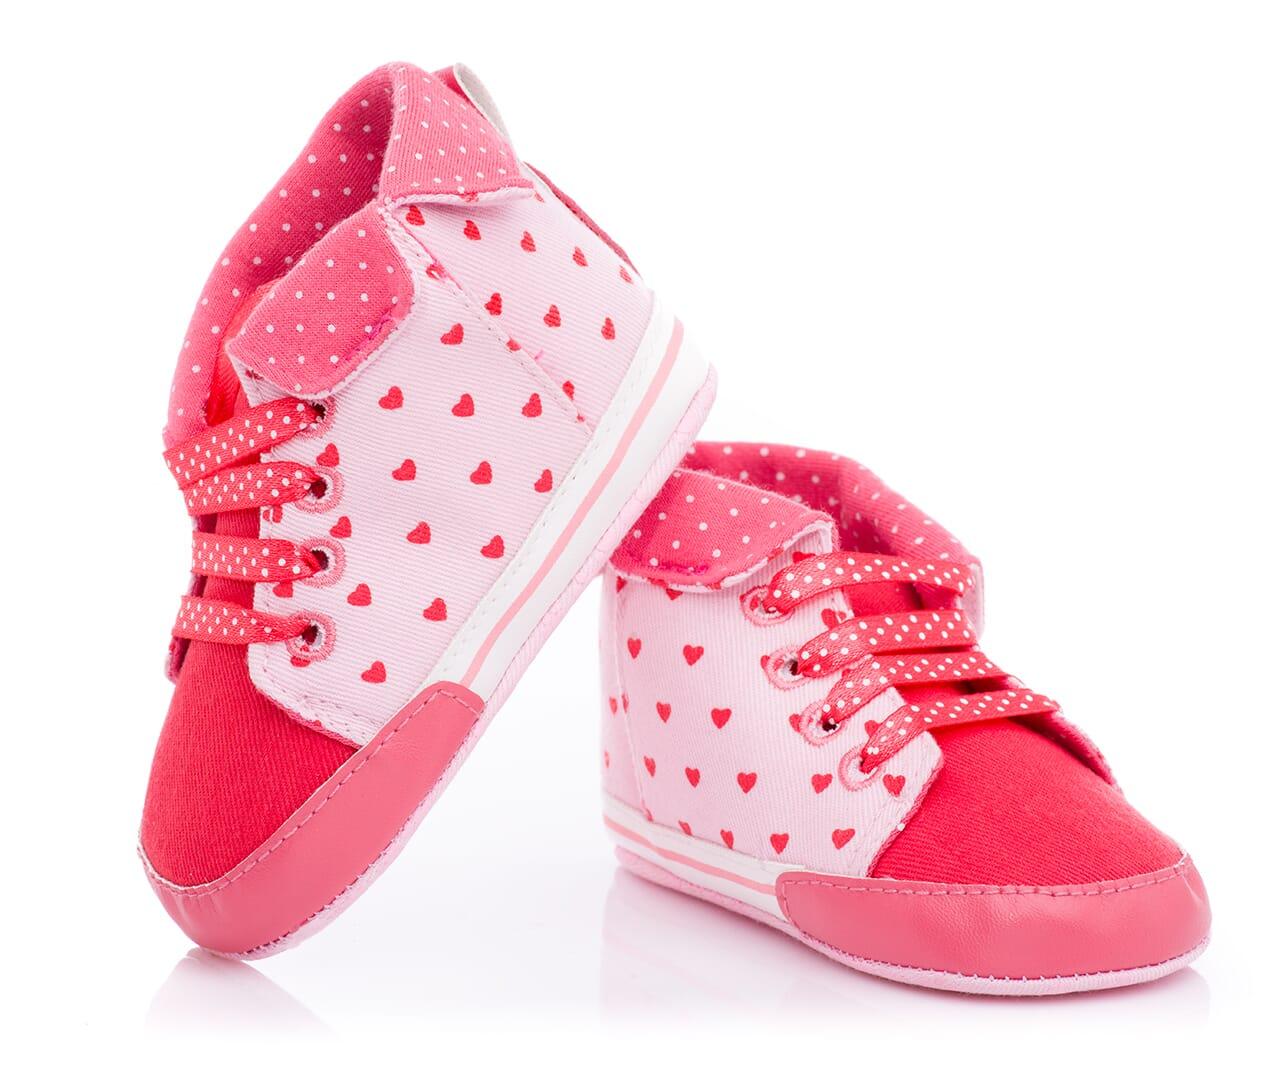 ktr_015_pink